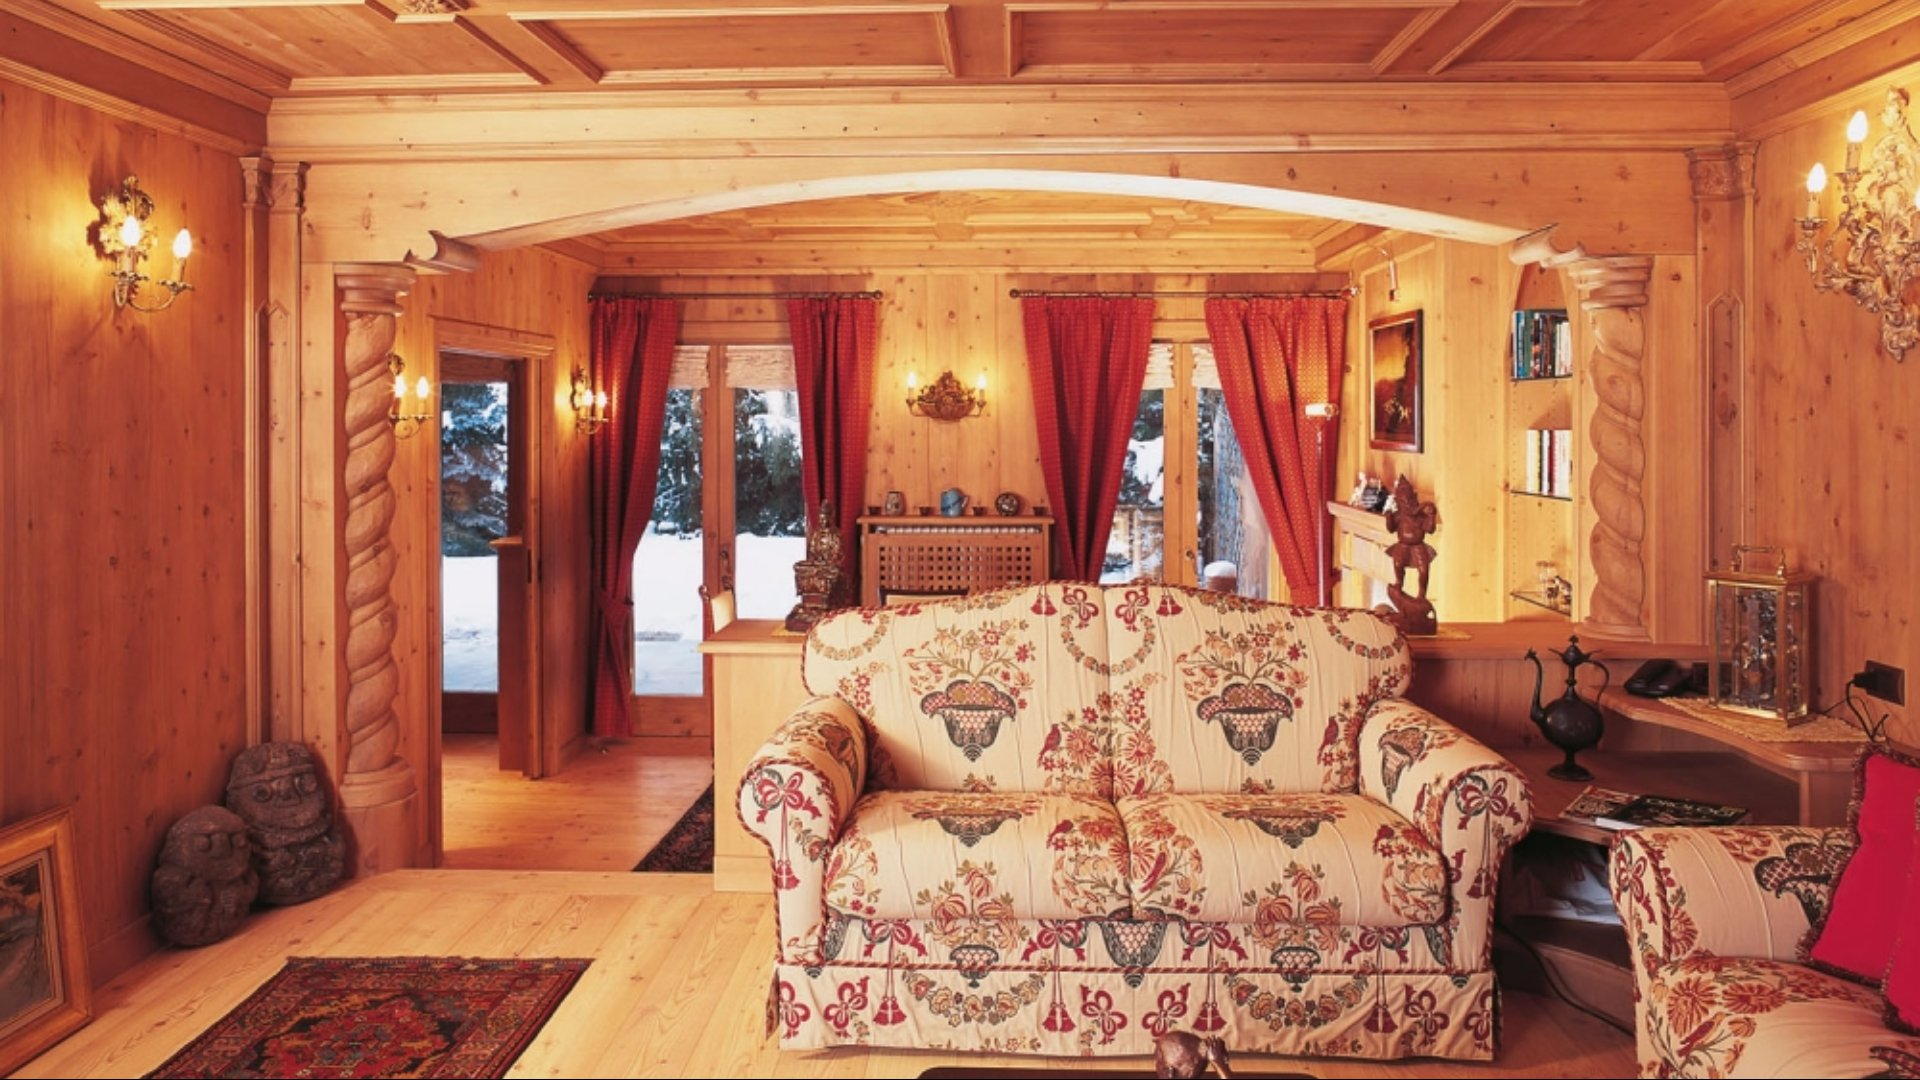 Residenza privata  - Bormio - So 3